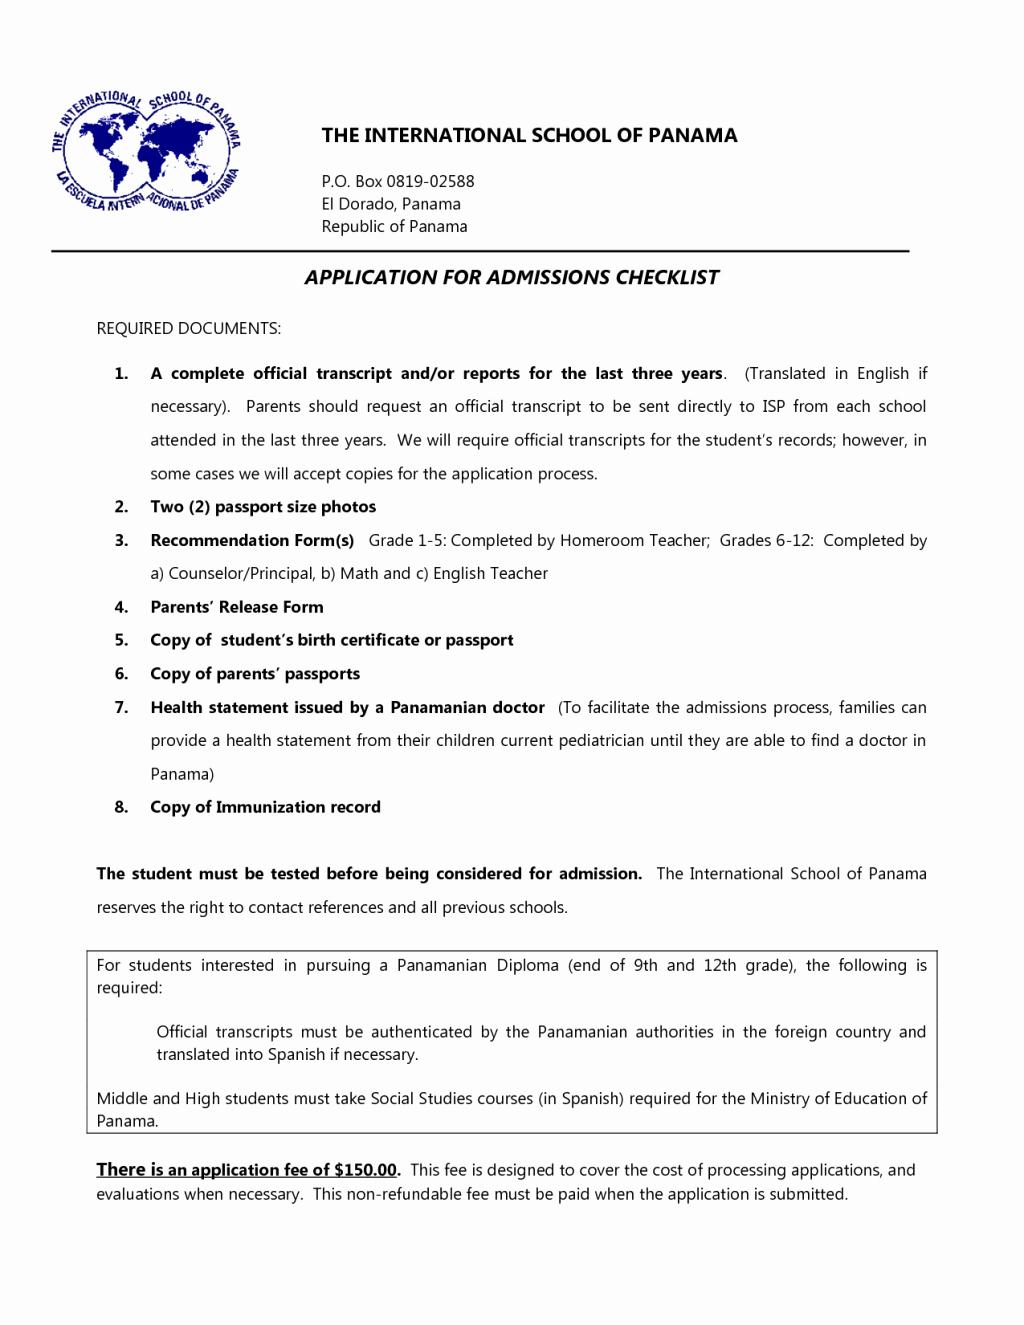 Mexican Birth Certificate Translation Template Elegant 25 Of Cuban Divorce Certificate Translation